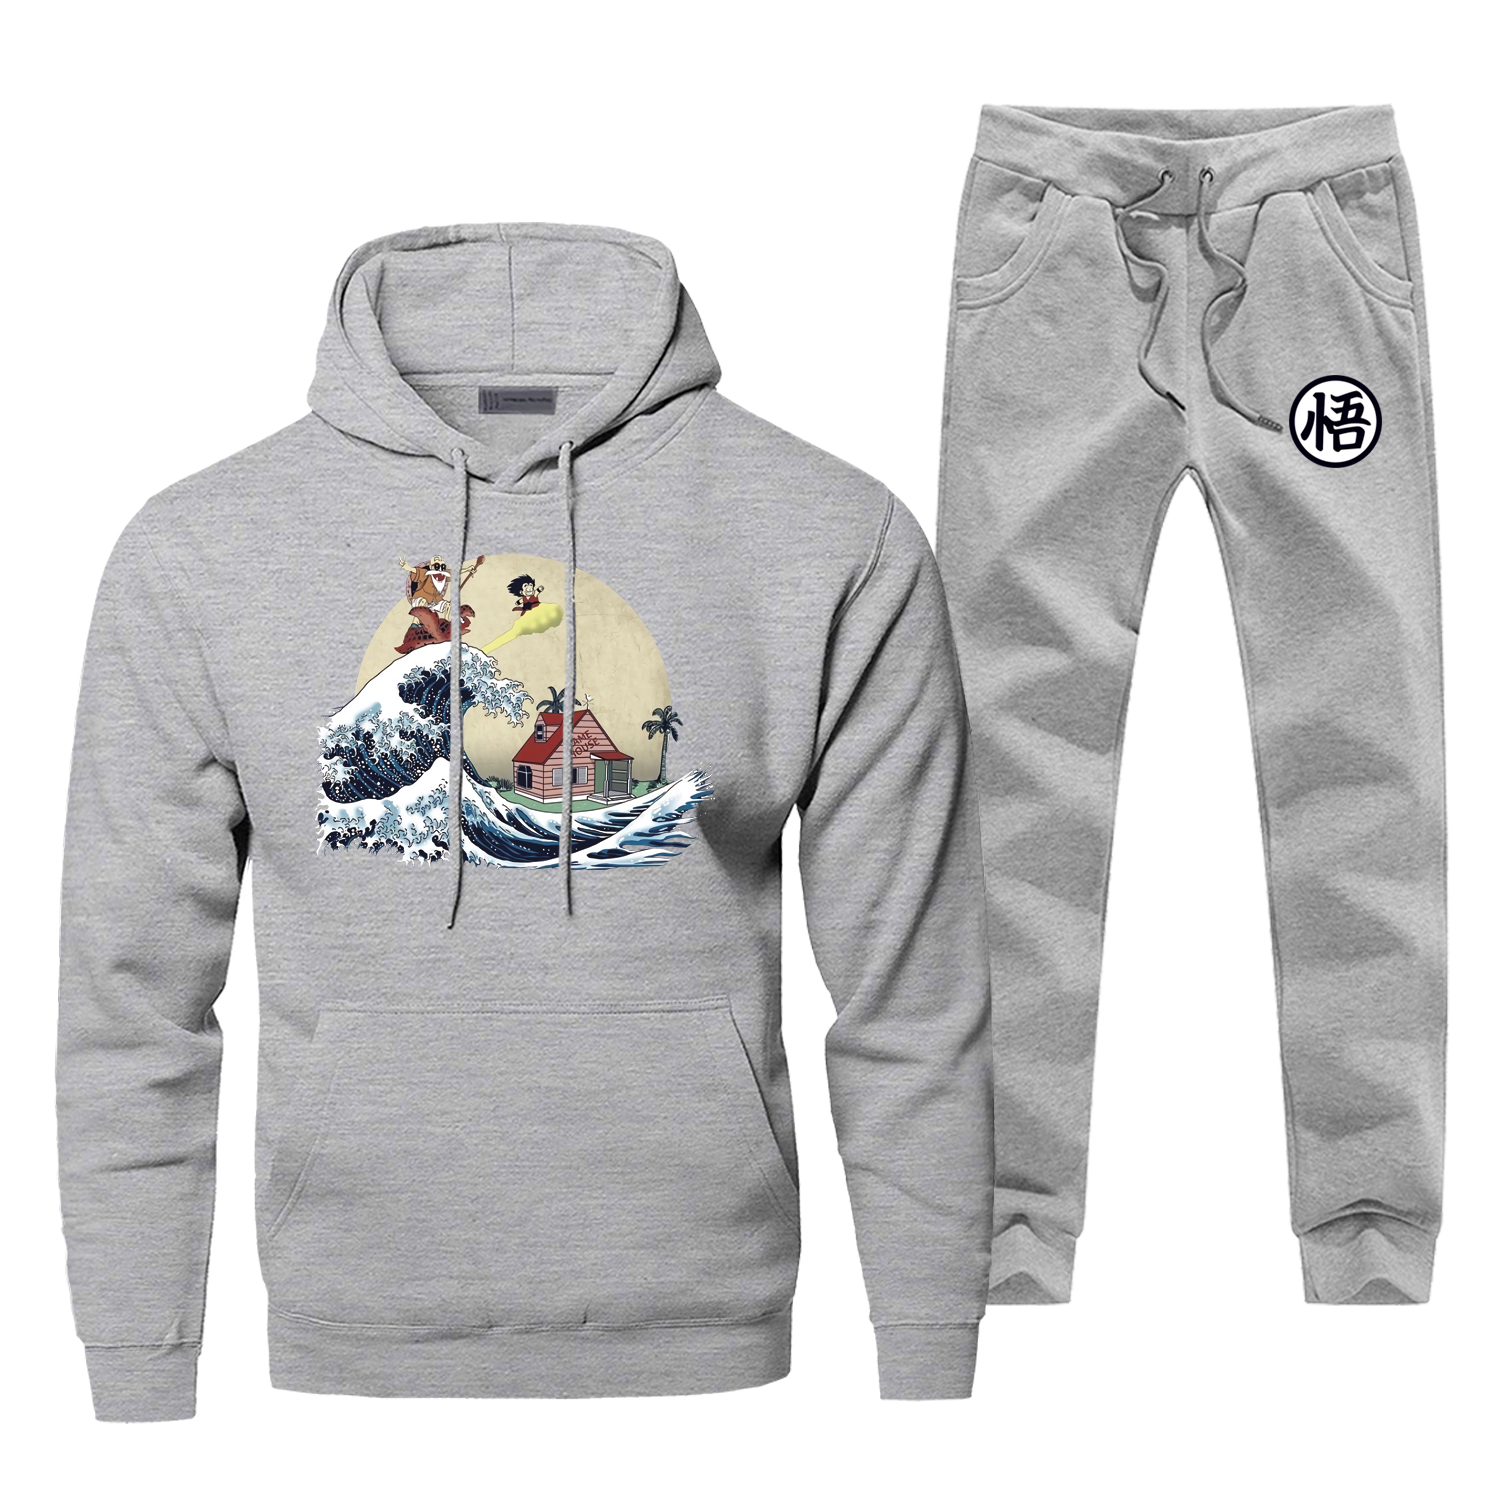 Dragon Ball Sweatshirts Print Cartoon Turtle Dragon Ball Hoodies+pants Two Piece Sets Casual Streetwear Dragon Ball Sportswear